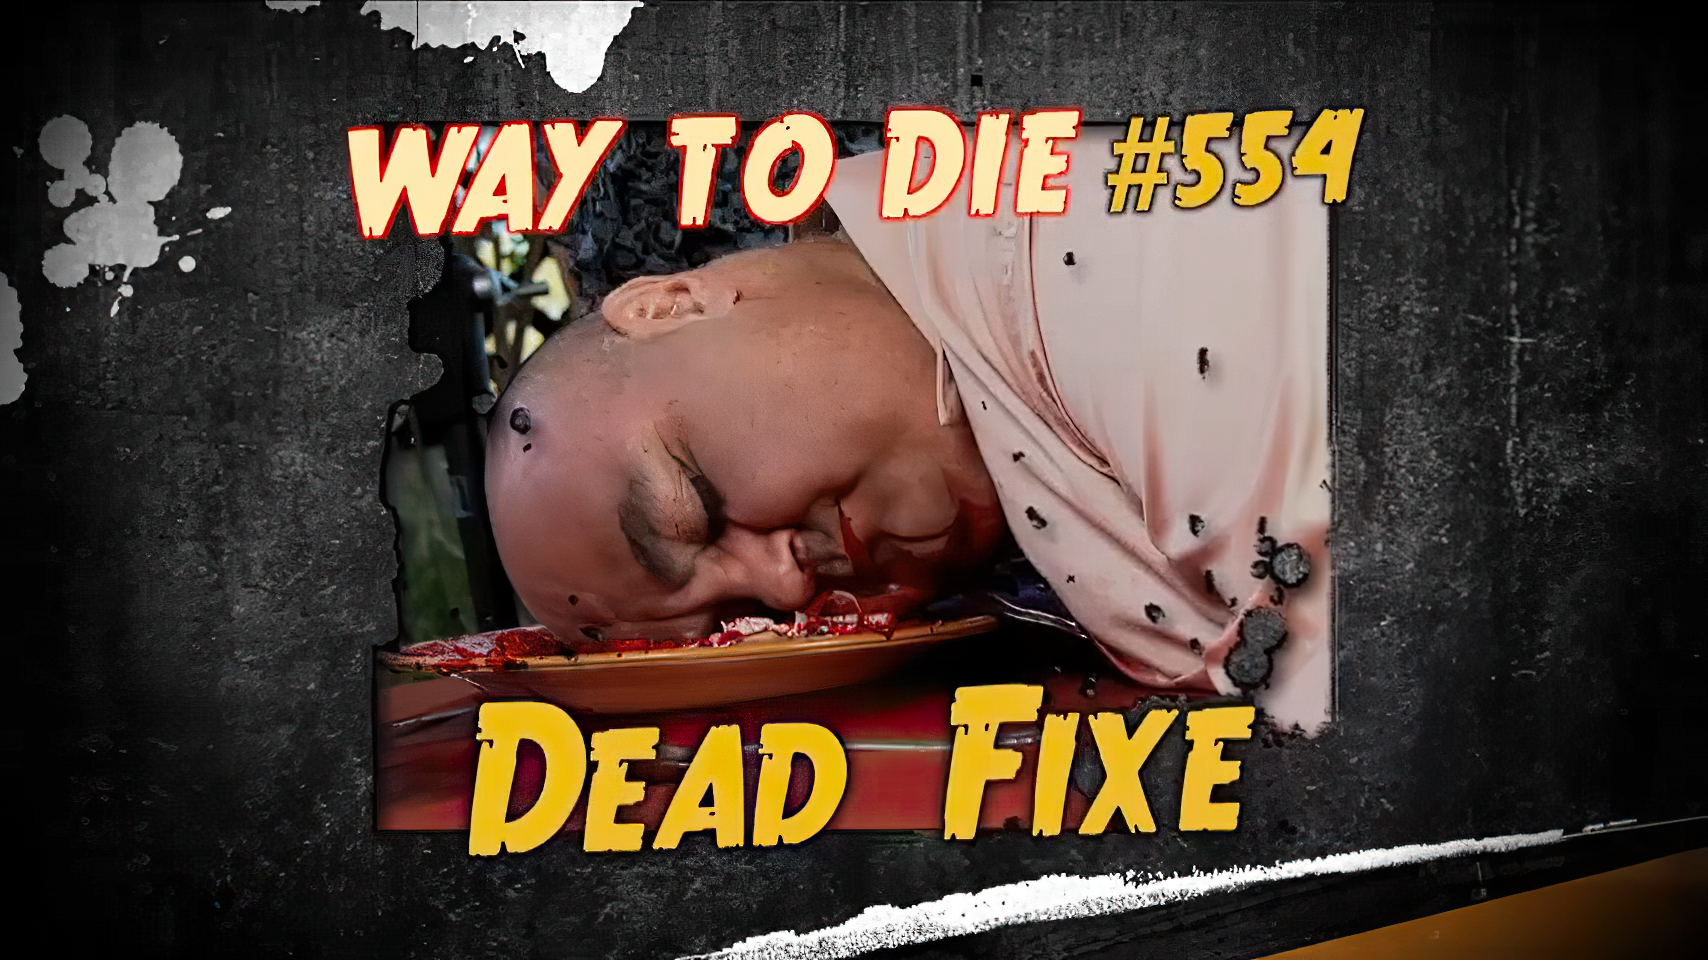 Dead Fixe